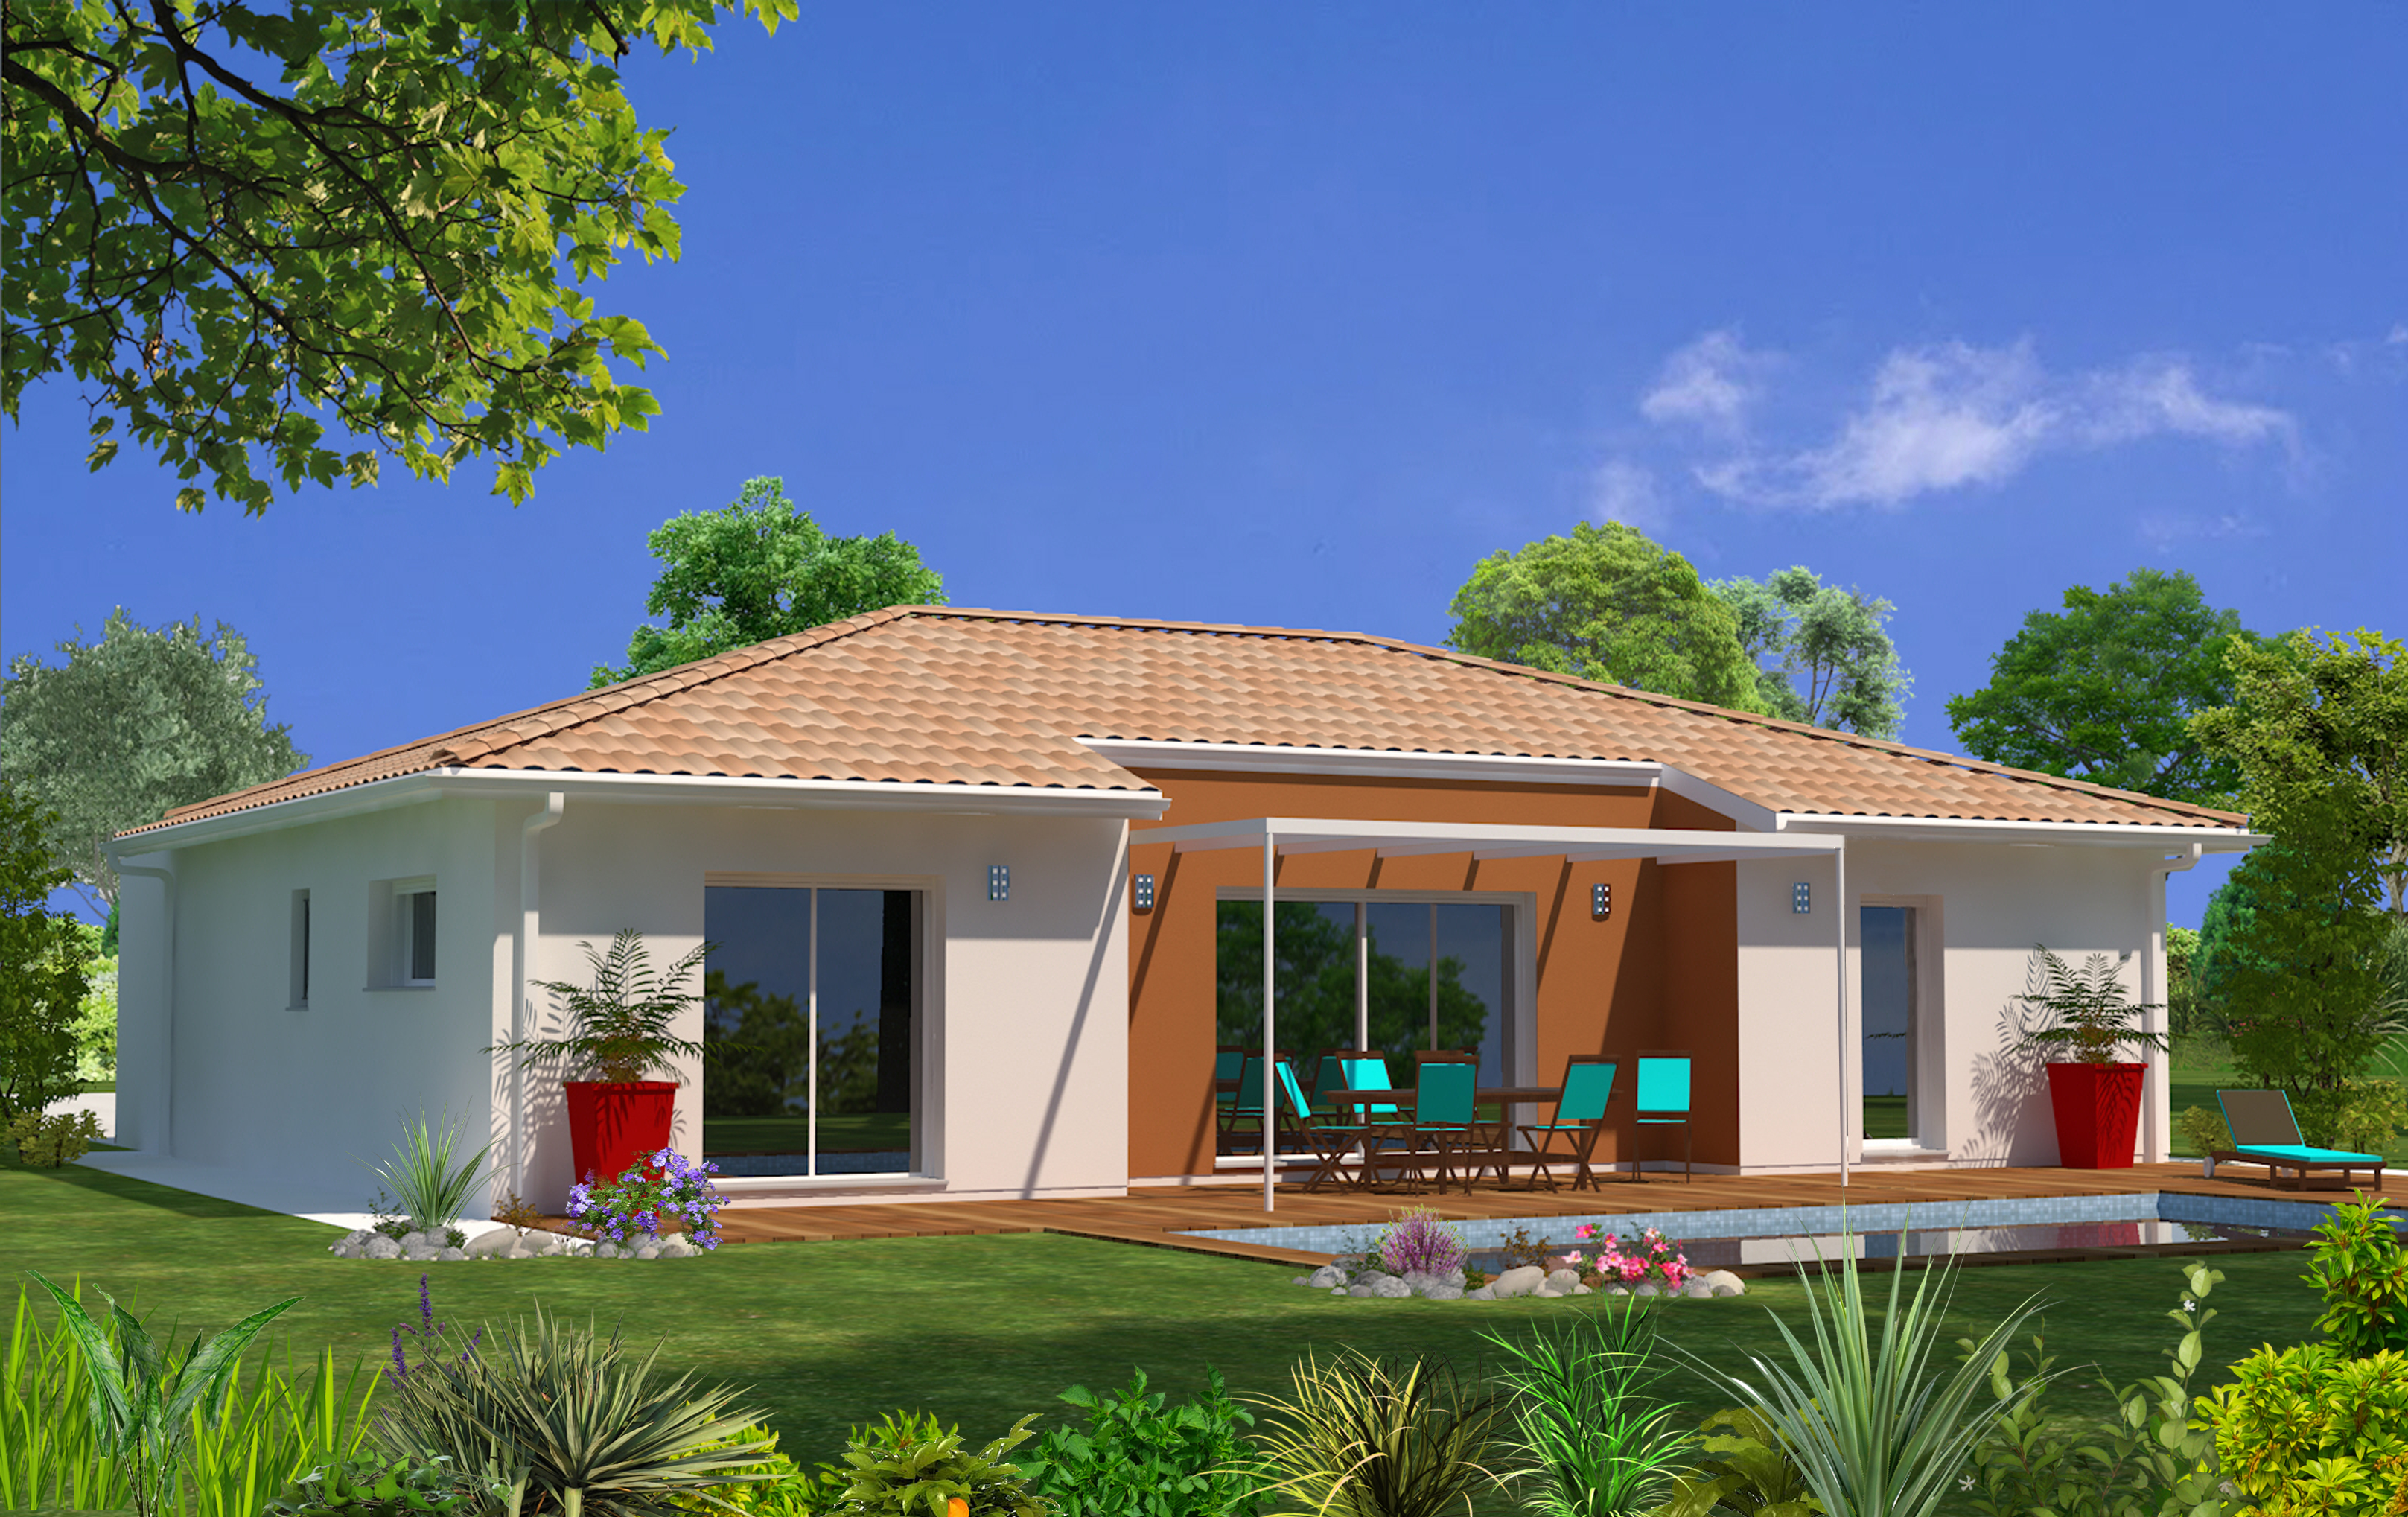 Maeva 33 maisons lara for Modele maison 3 chambres